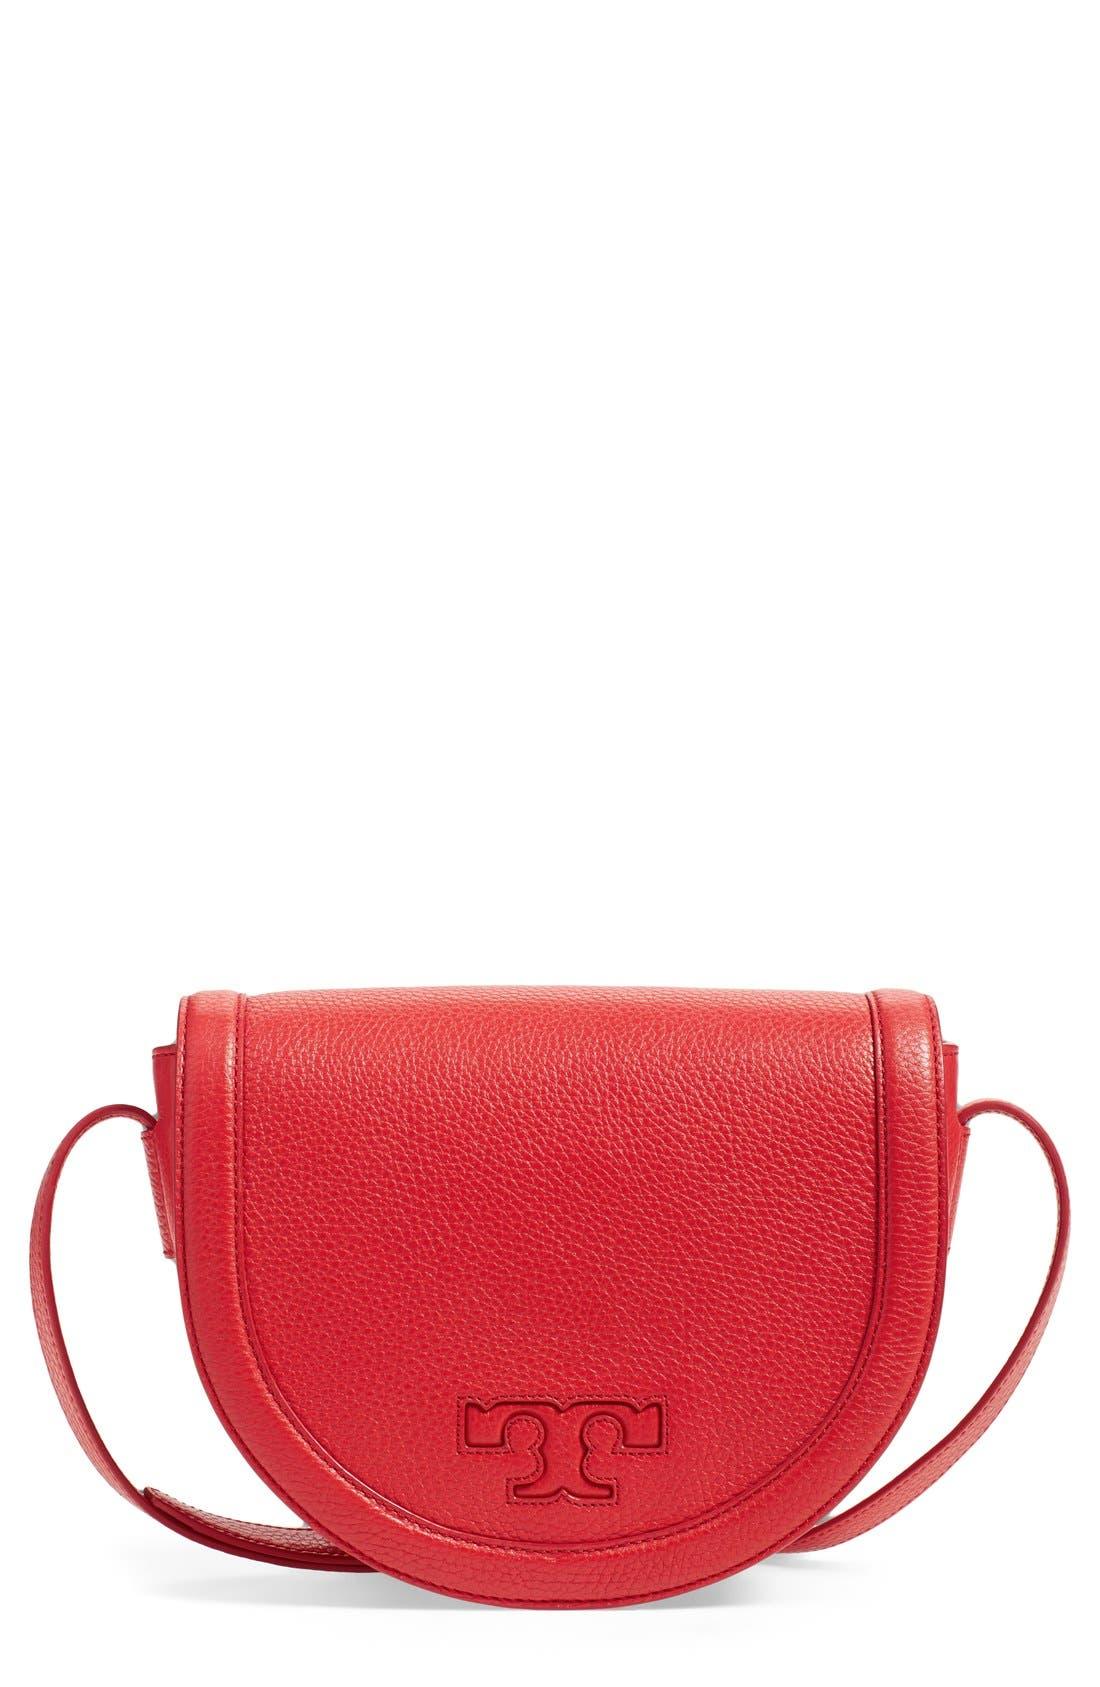 Main Image - Tory Burch 'Serif T' Leather Saddle Bag